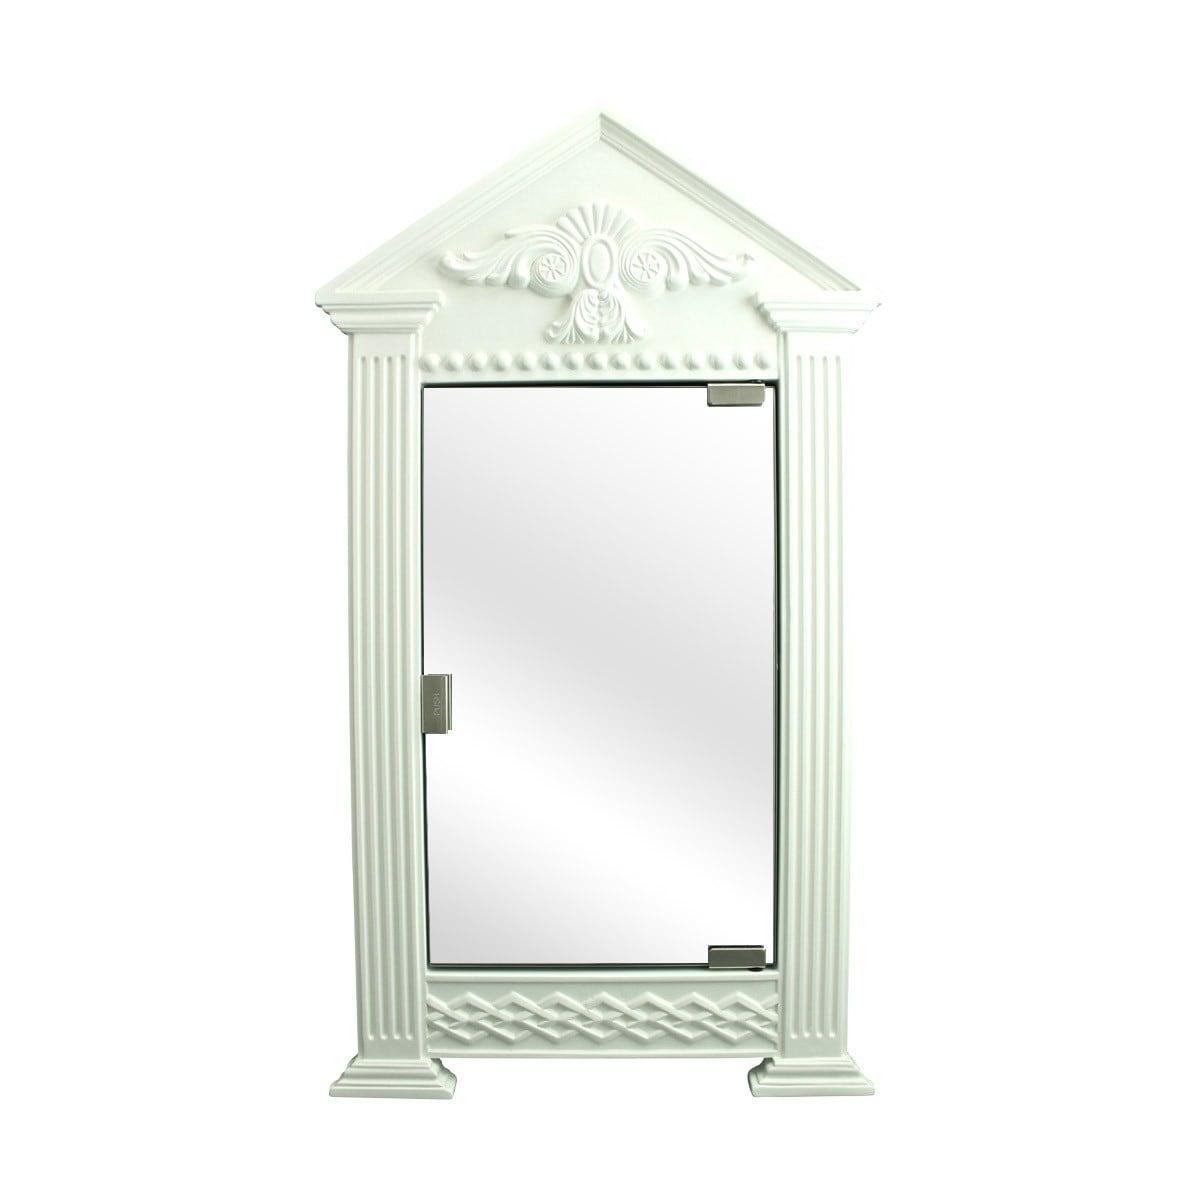 Renovators Supply Premium White Urethane Medicine Cabinet Organizer Corner Shelves Colonial Design With Mirror